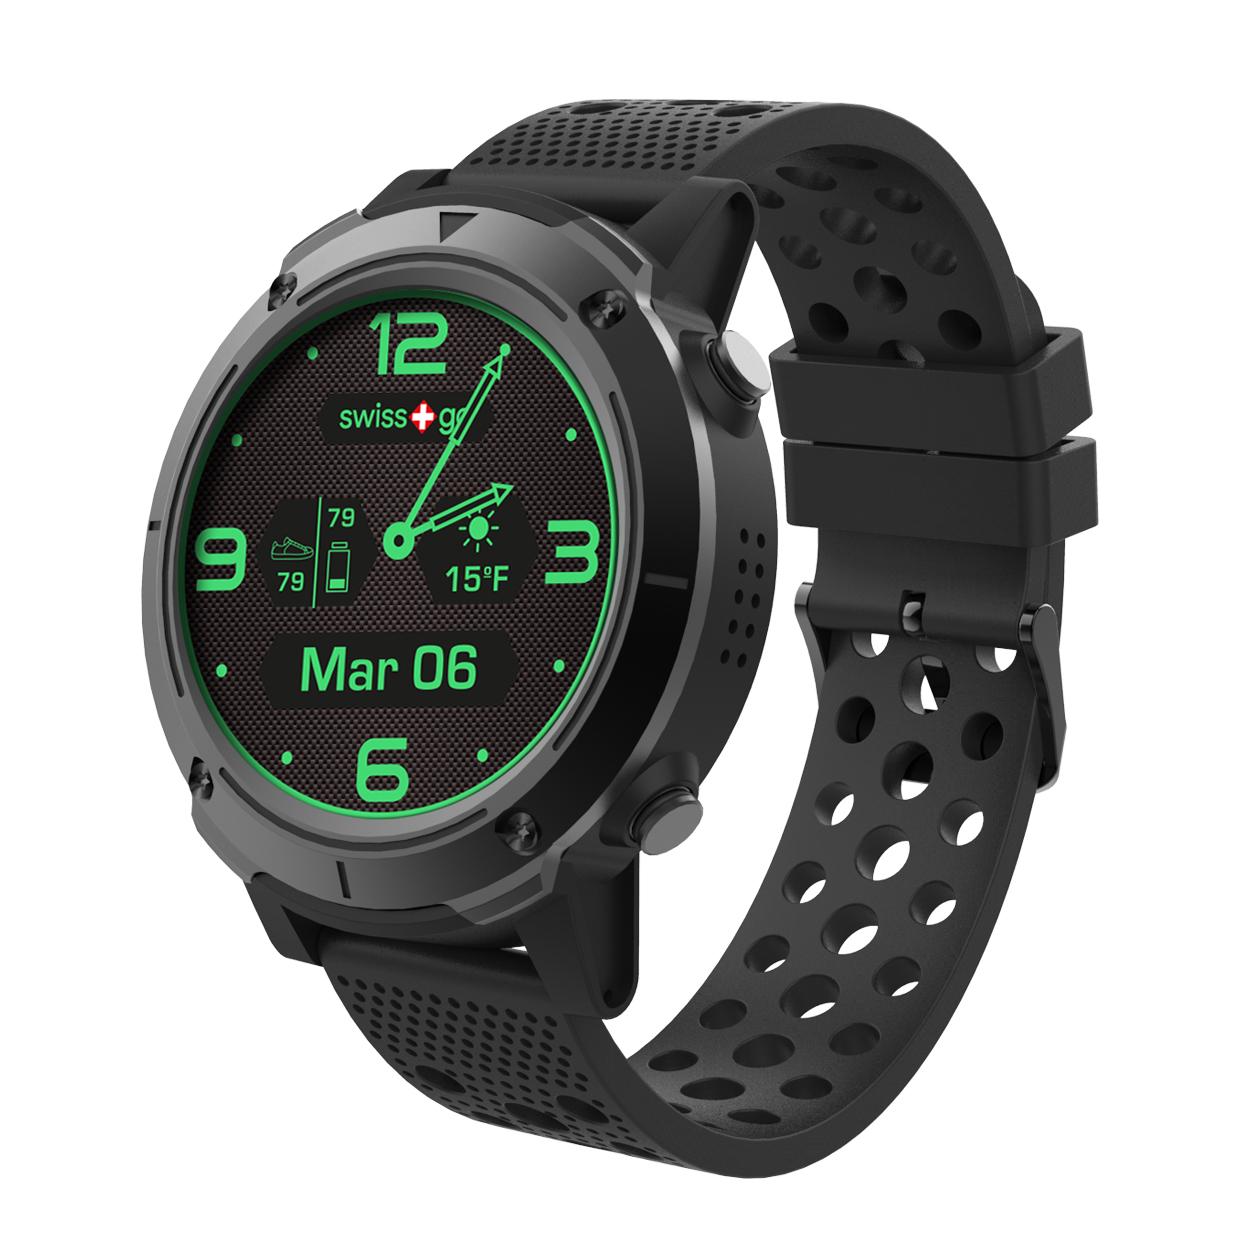 Smartwatch Zermatt